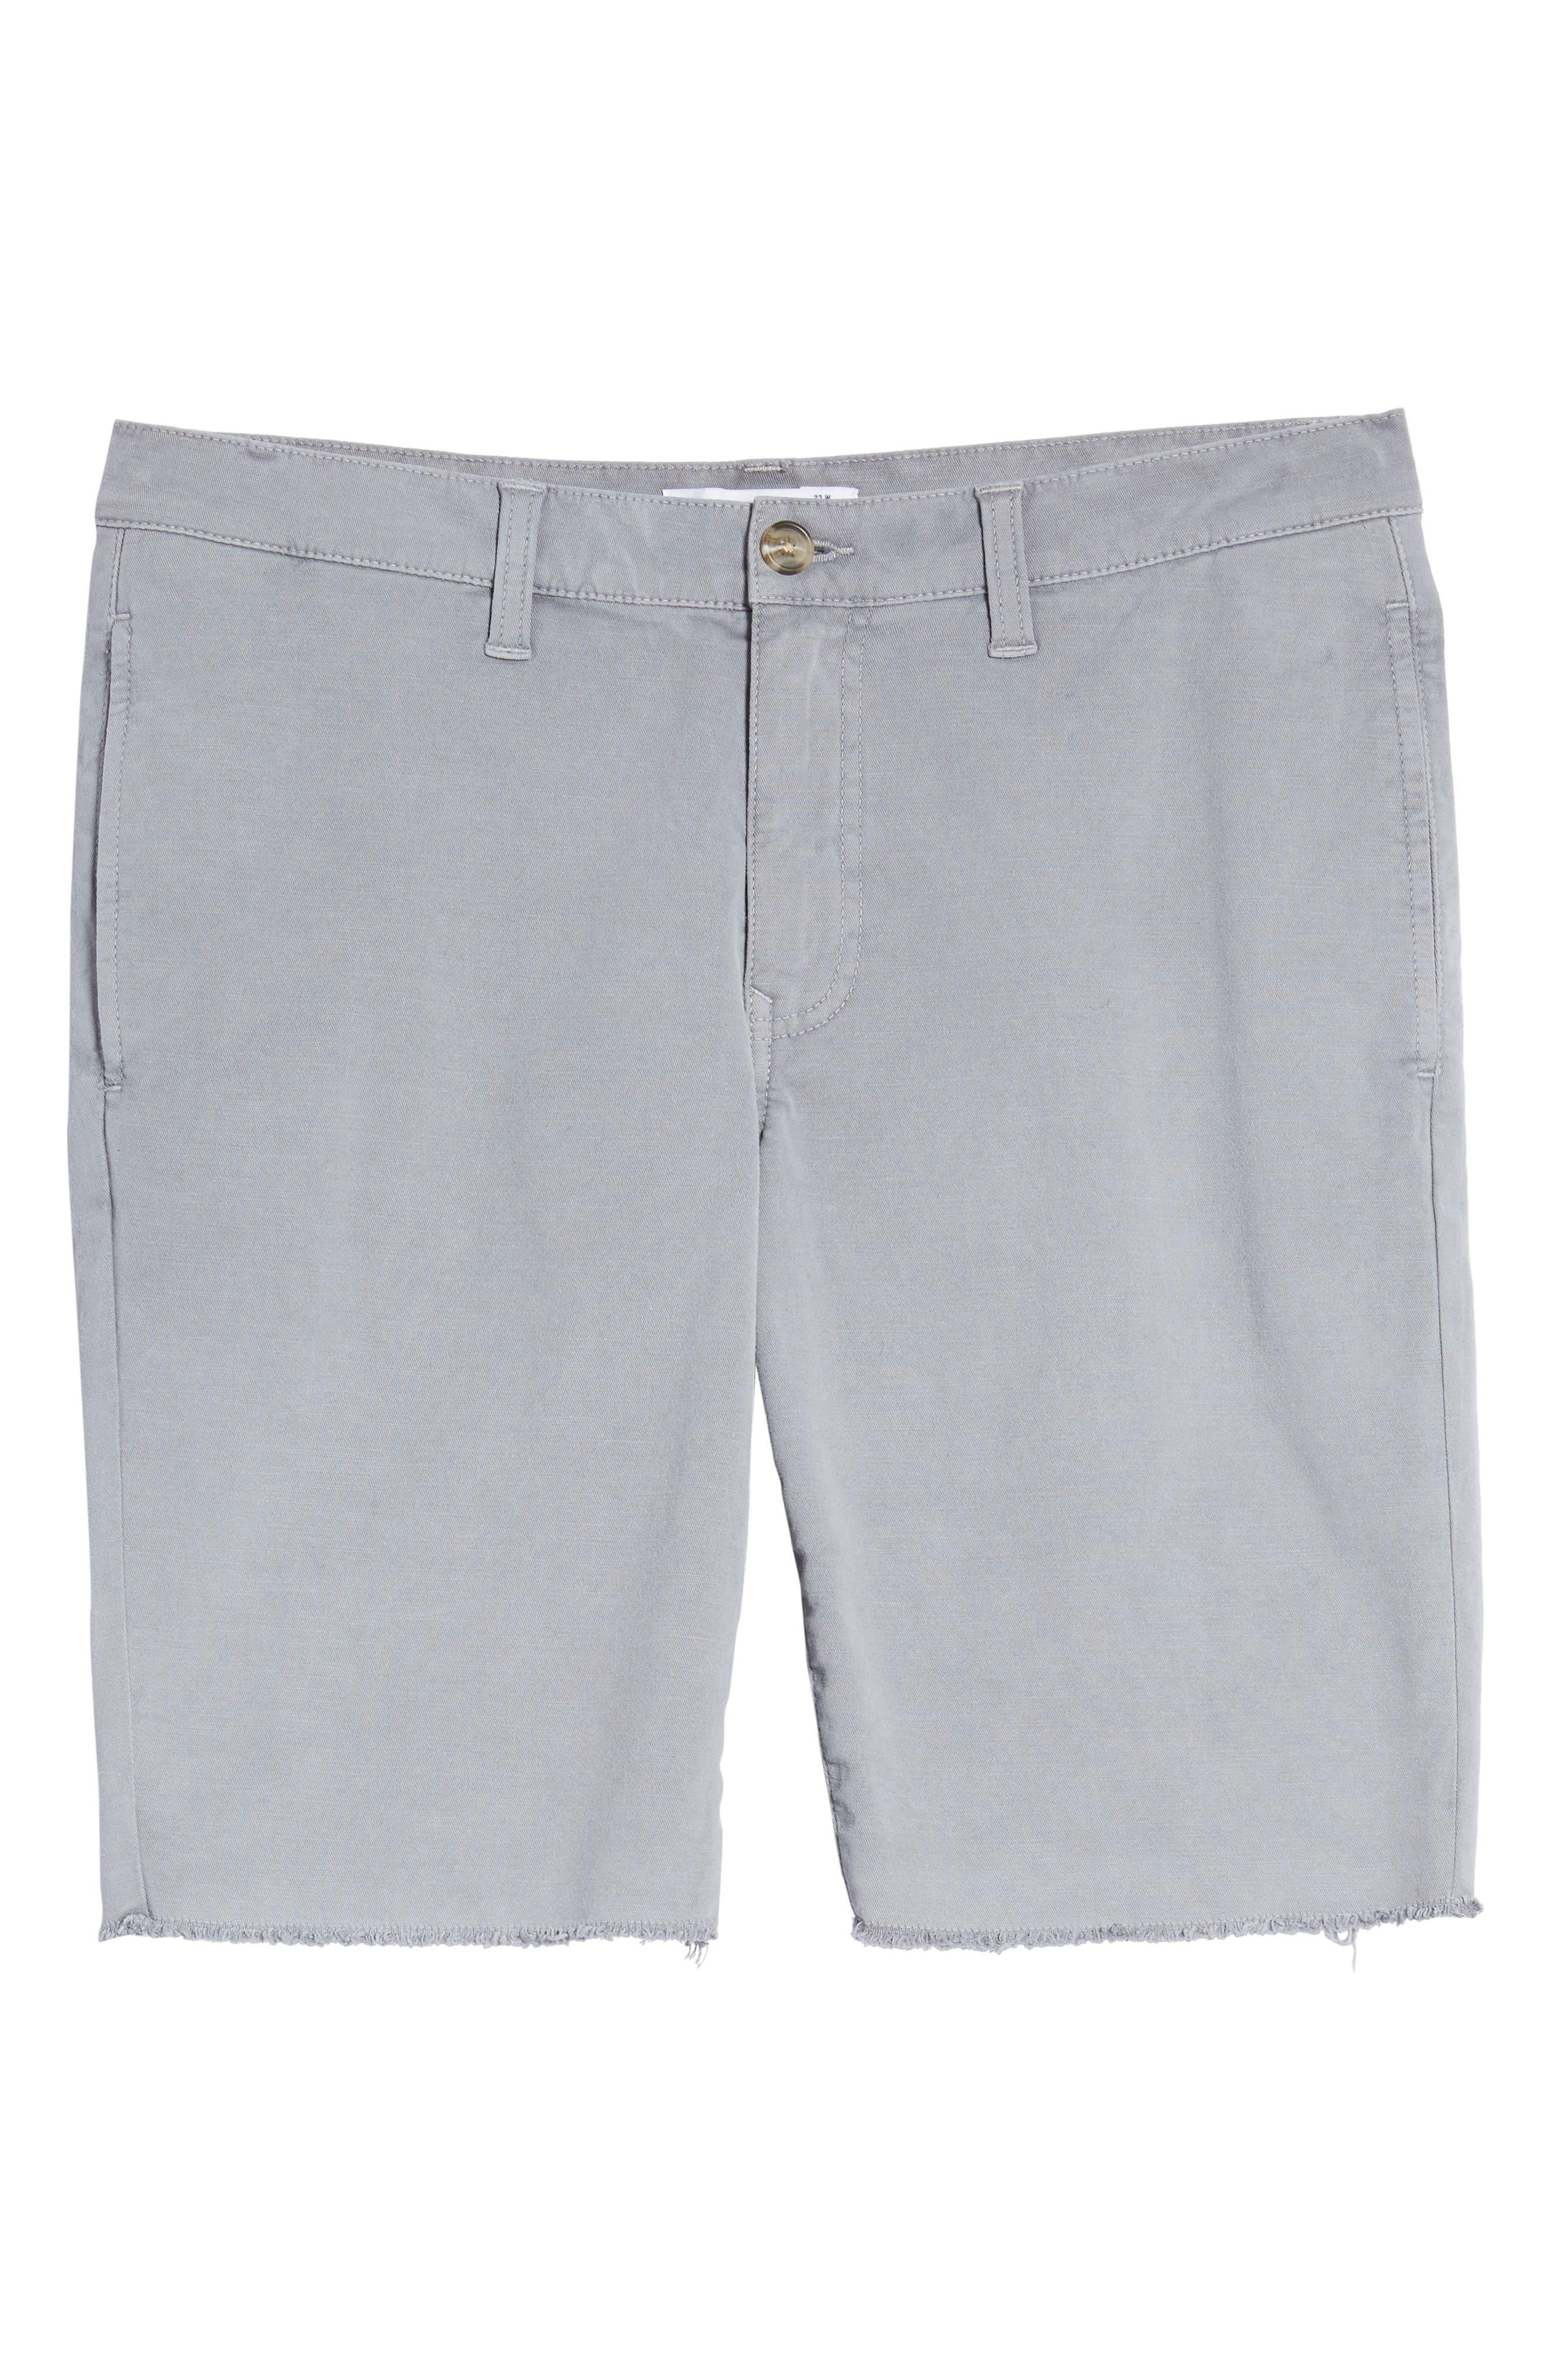 Frost Wash Shorts,                             Alternate thumbnail 6, color,                             050